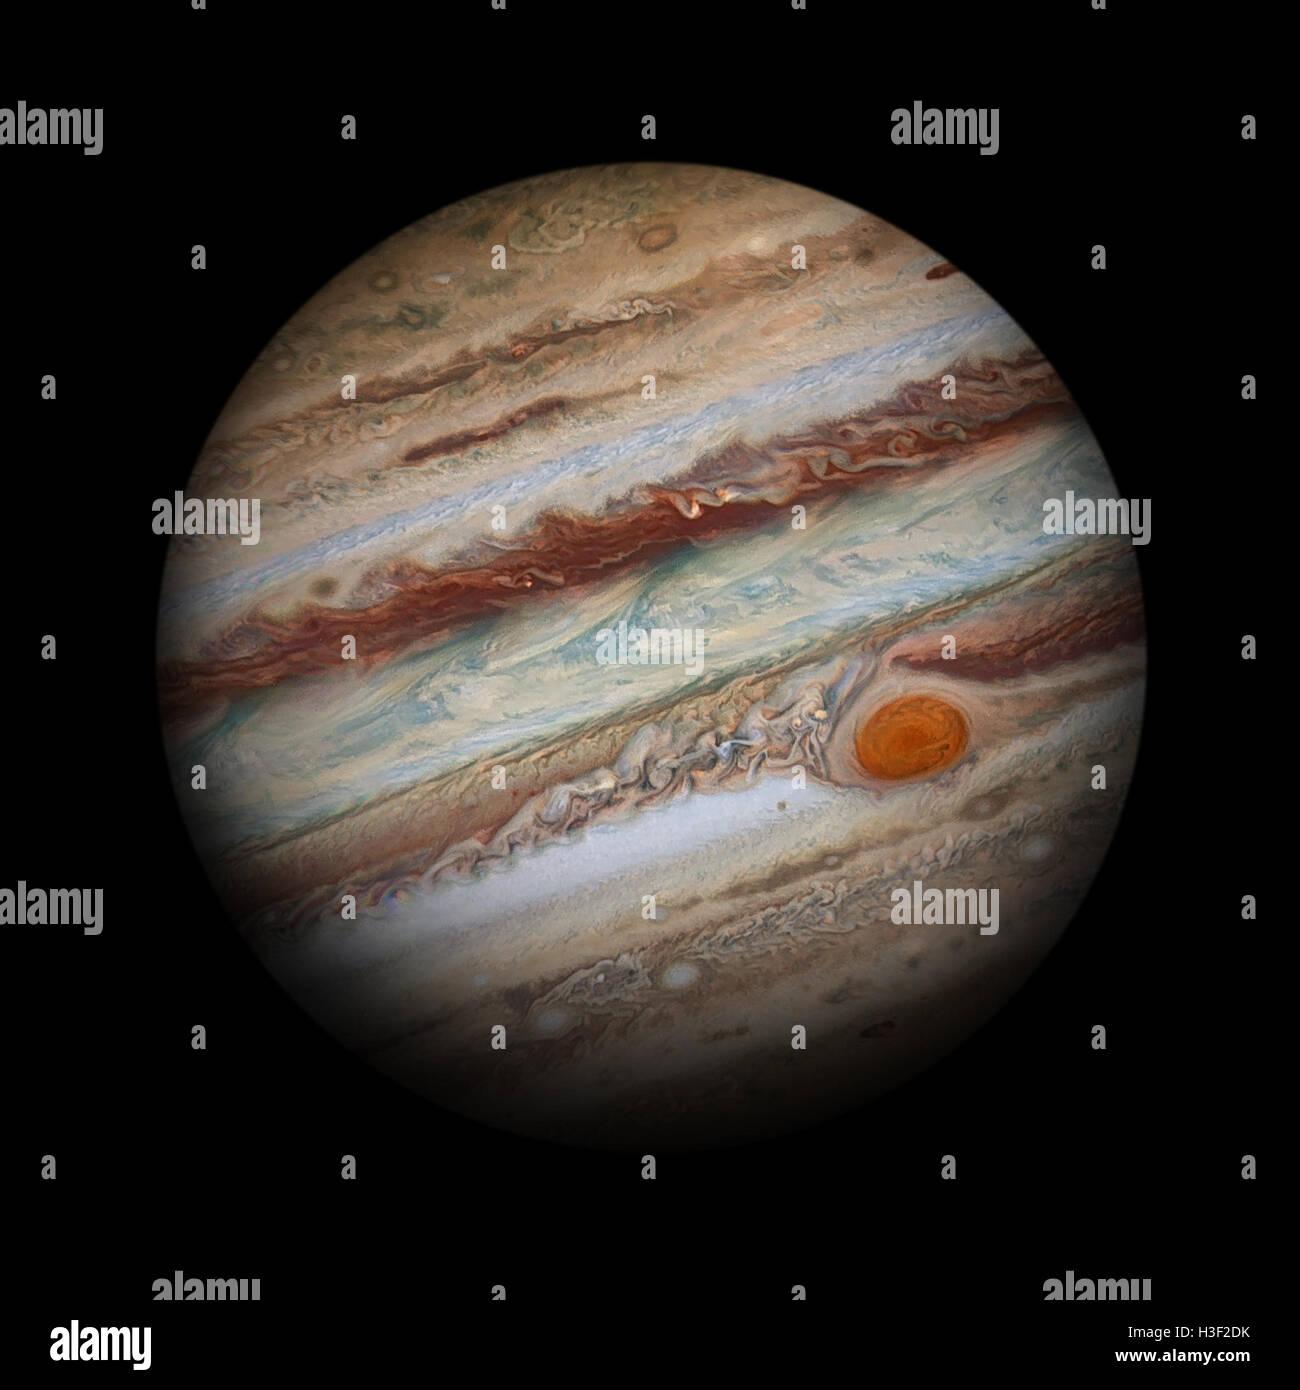 solar system jupiter - photo #22